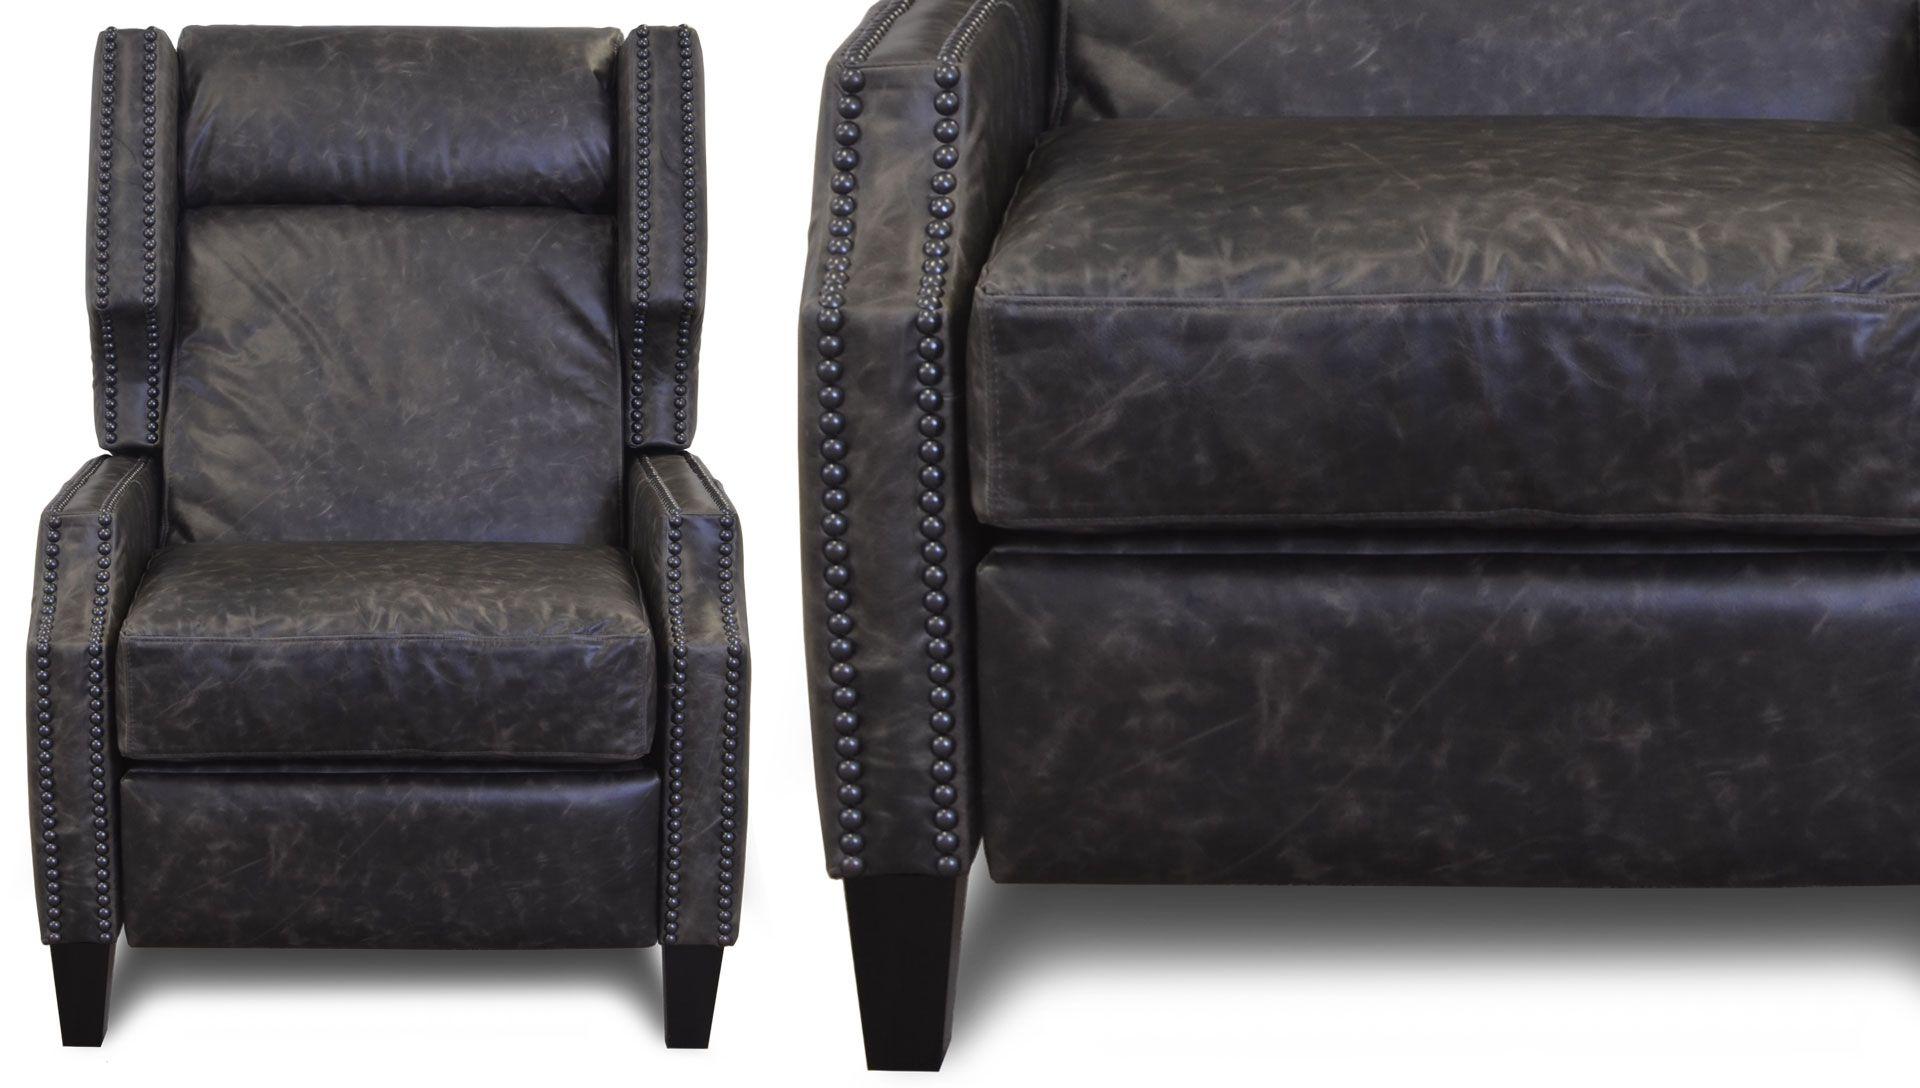 Knottsberry Push Back Recliner Leather Sofa Co